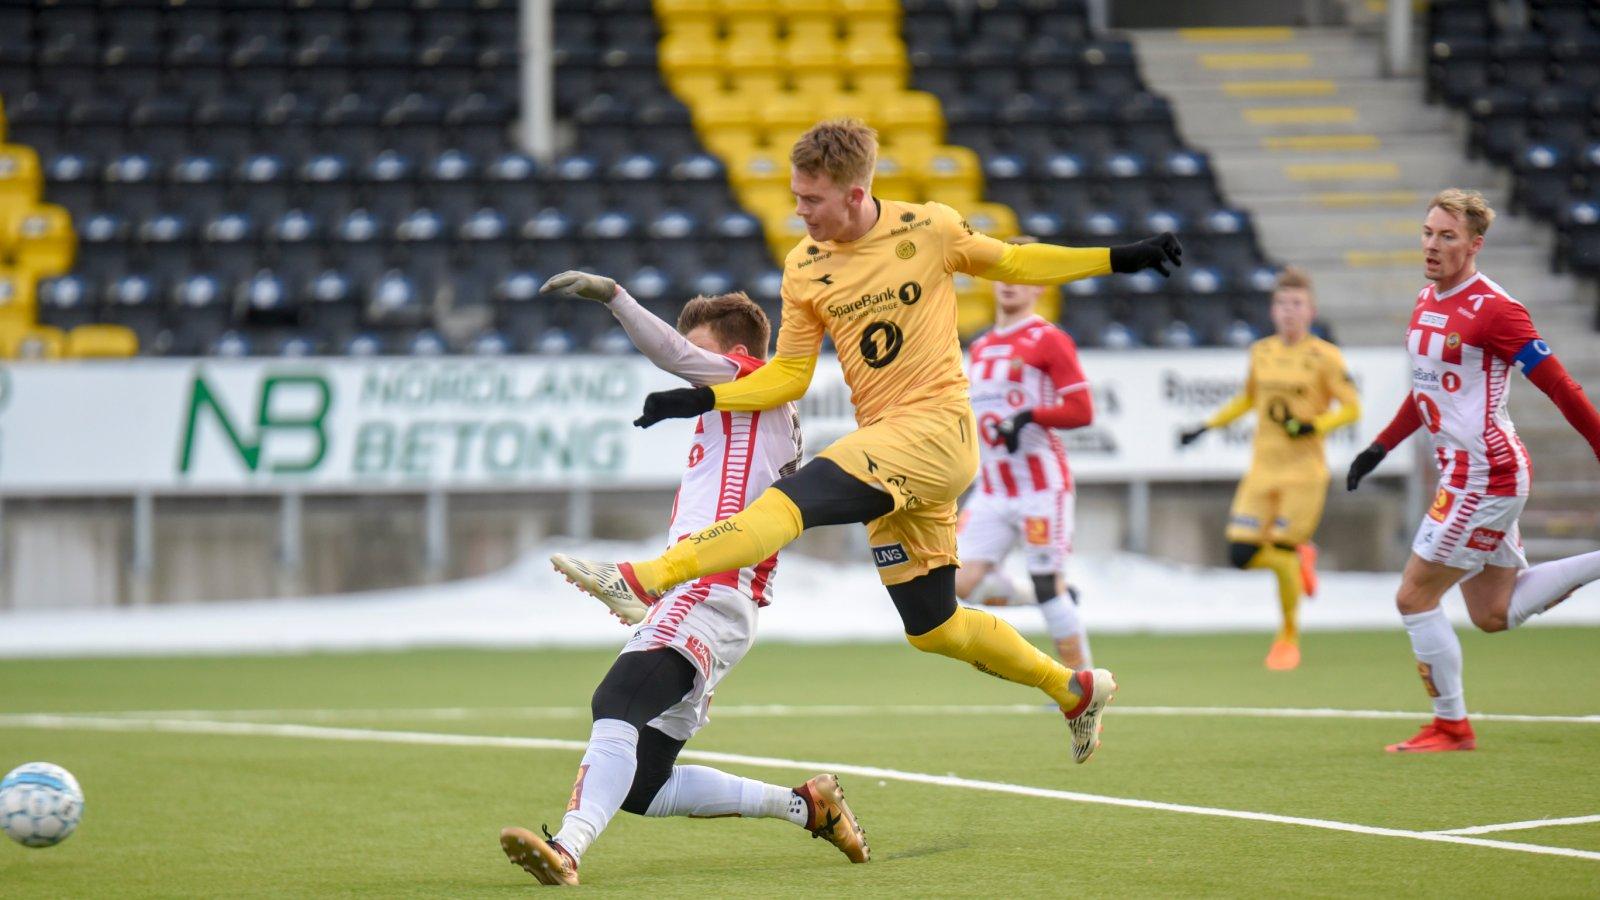 Kristian Fardal Opseth setter mål mot Tromsø IL.